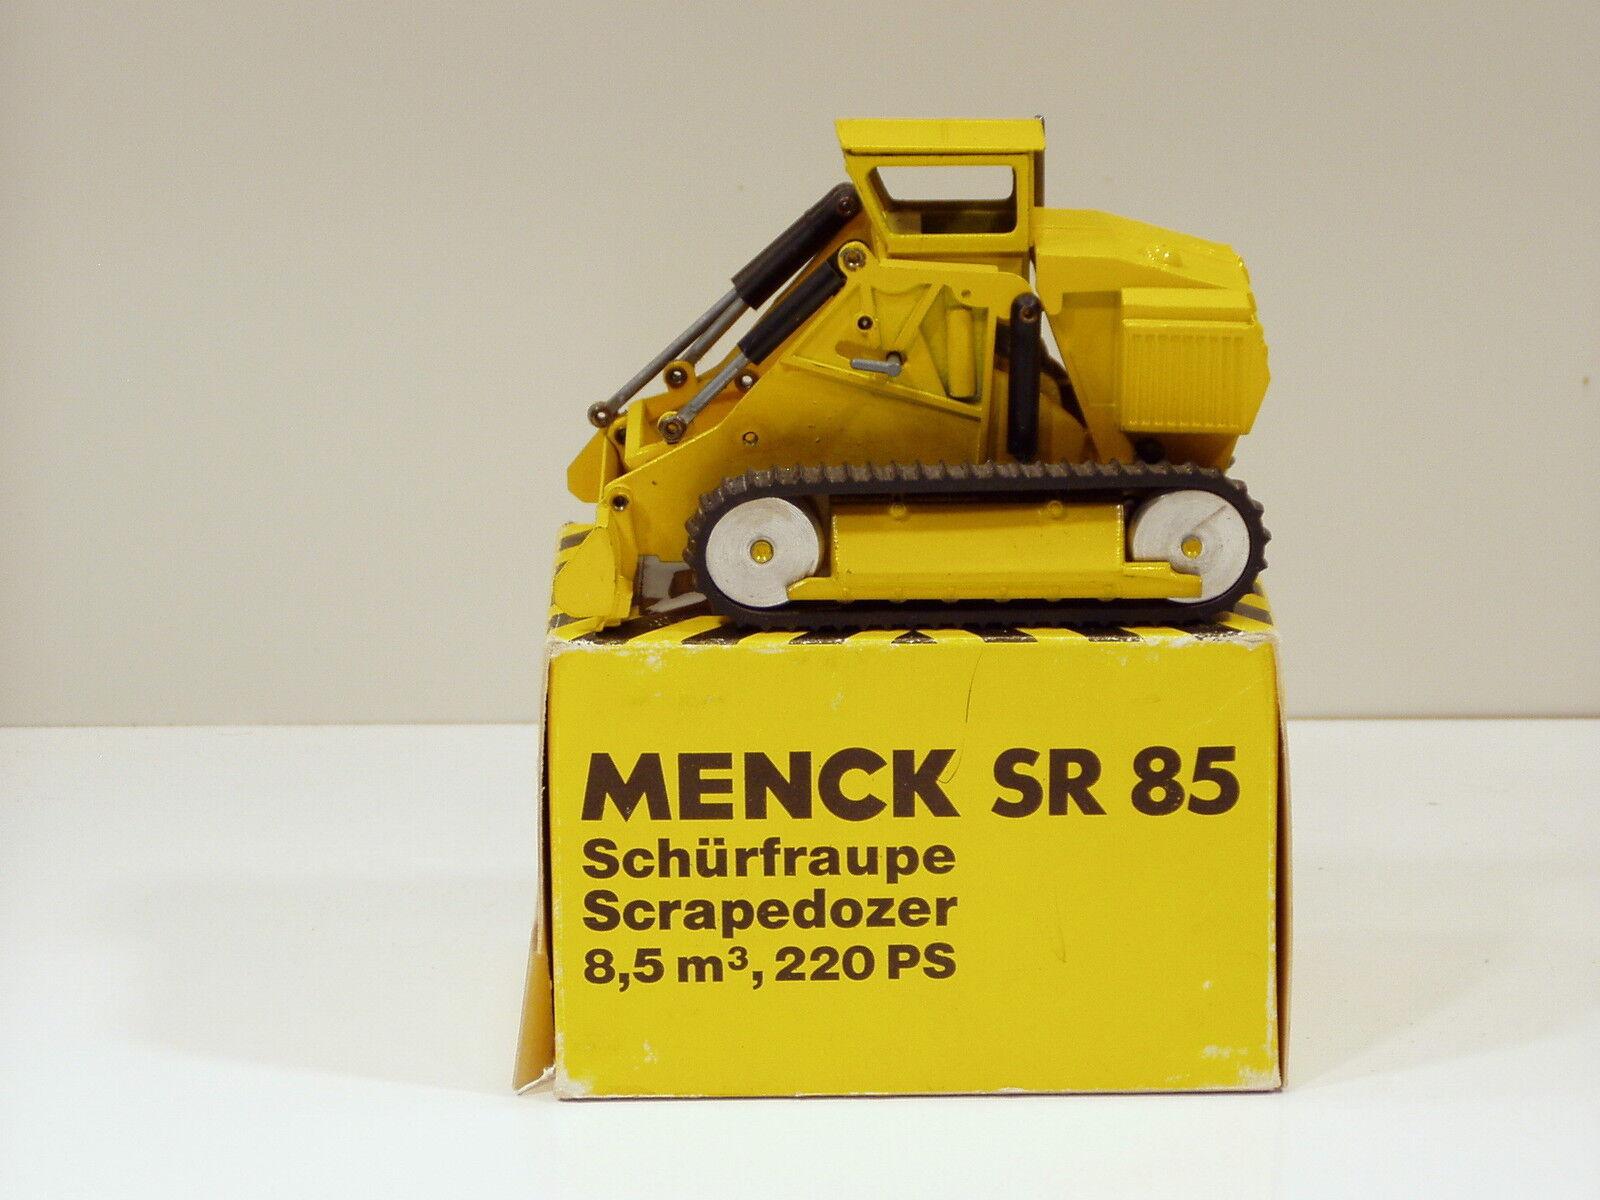 Menck SR85 Scrater Dozer - 1 50 - NZG N.MIB